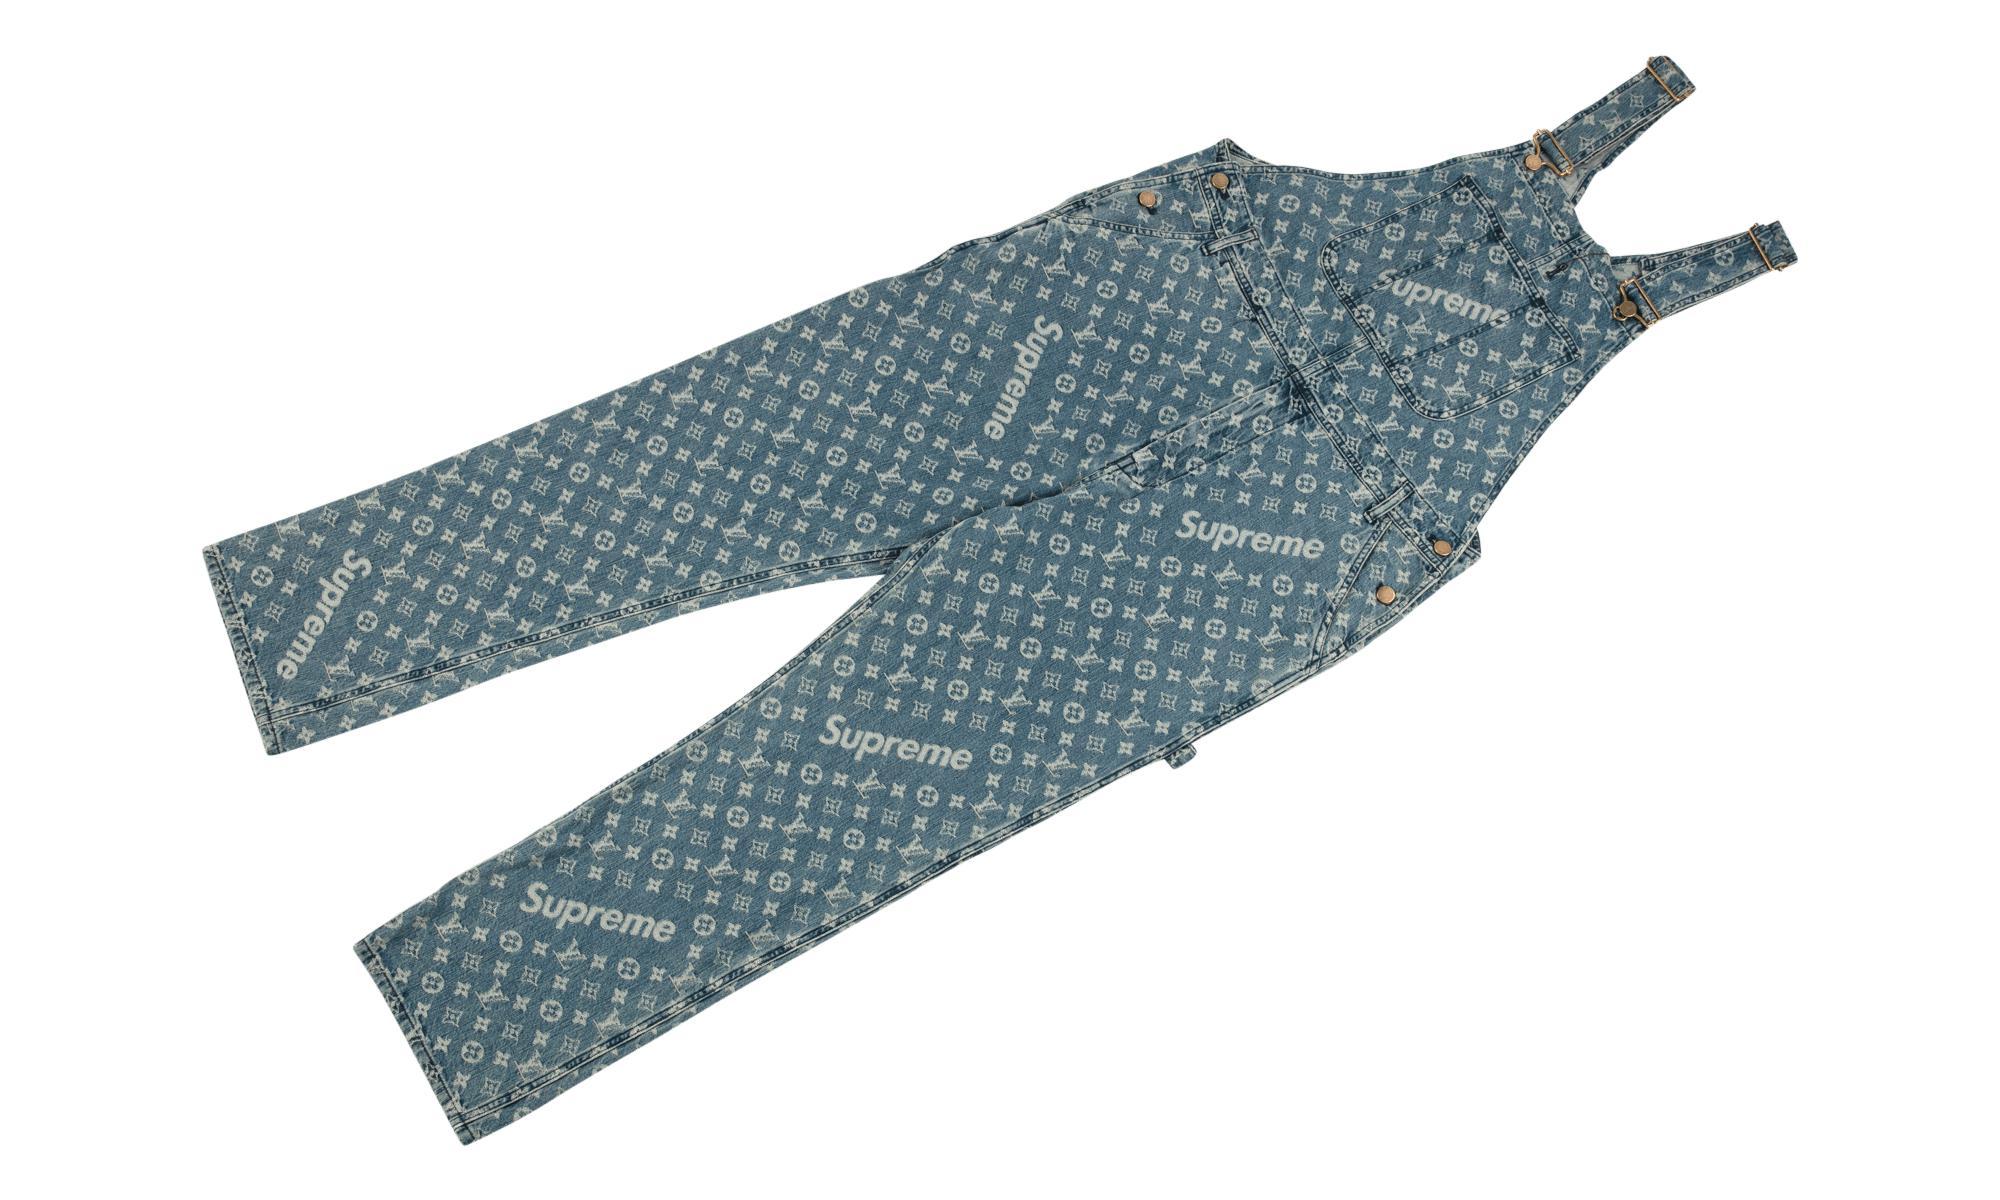 a75b3120b67 Louis Vuitton Jacquard Denim Overalls in Blue - Lyst